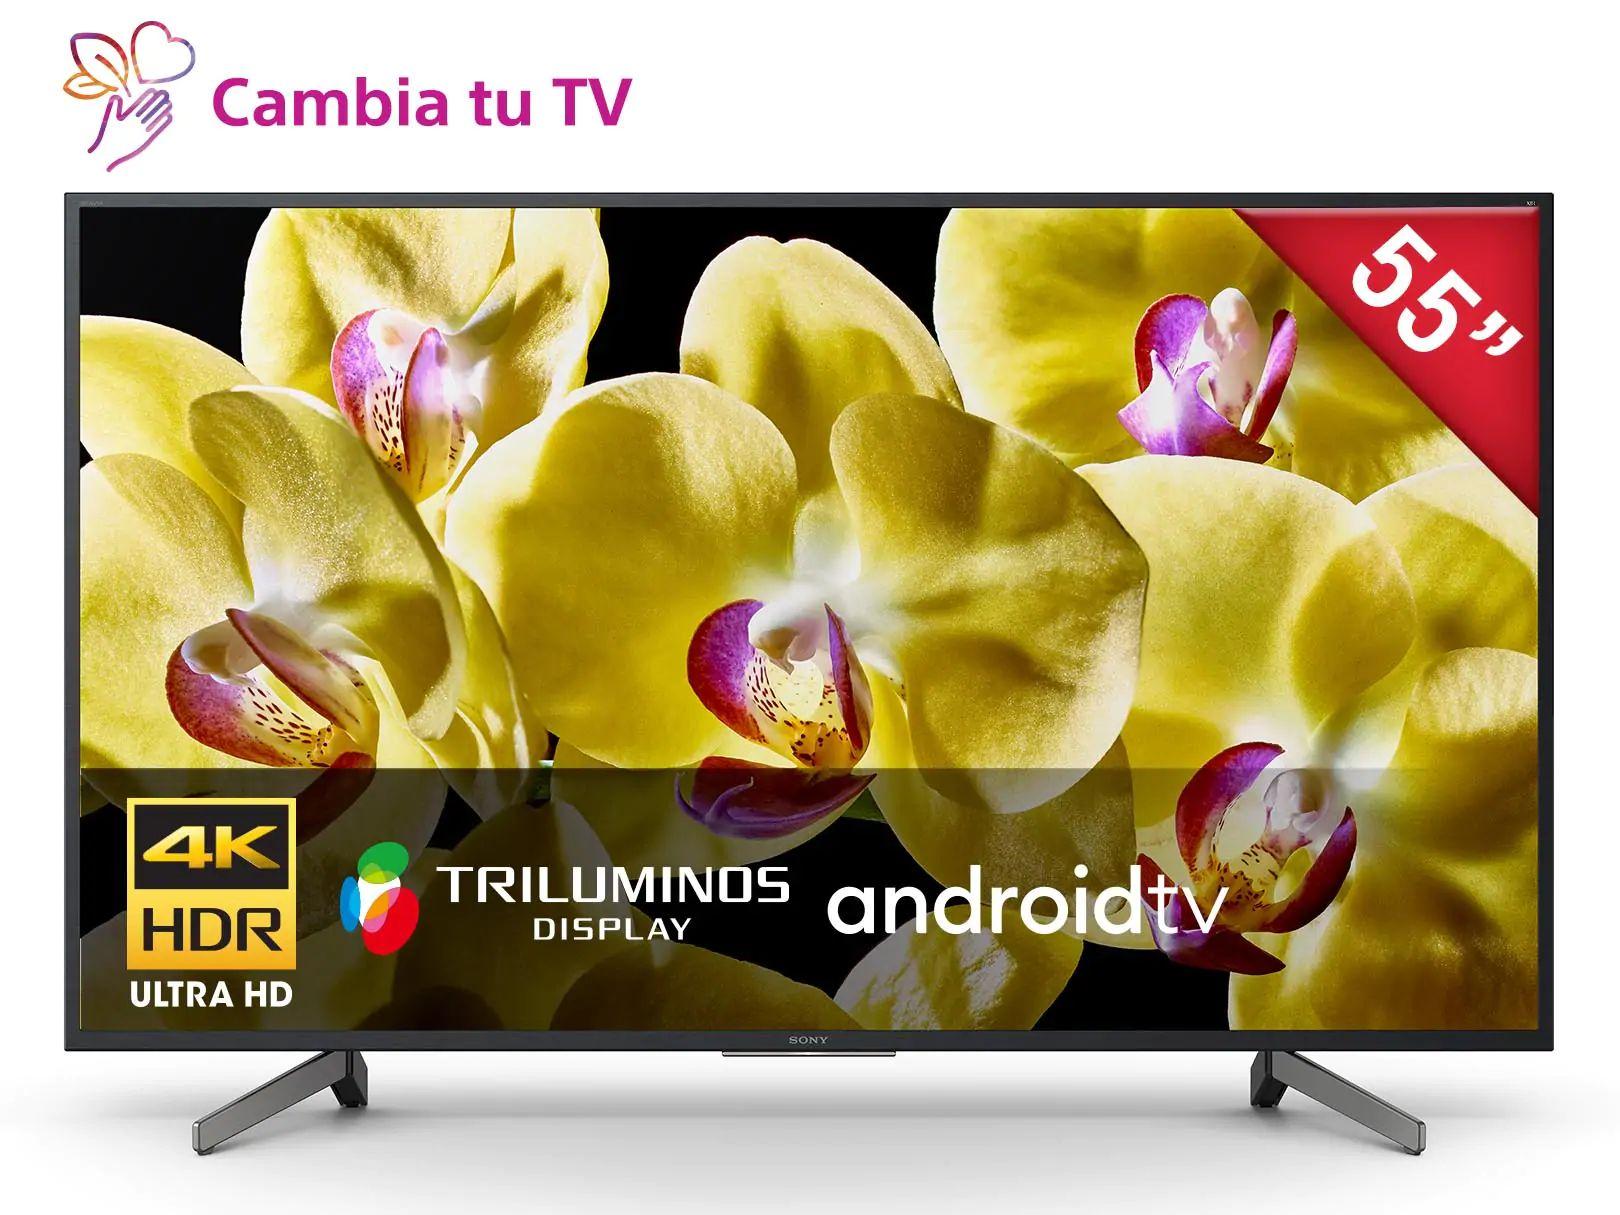 "Liverpool:Pantalla Sony 4K HDR de 55"" Mod. XBR-55X800G, con Triluminos display Smart TV LED (Tarjeta digital Banorte)"